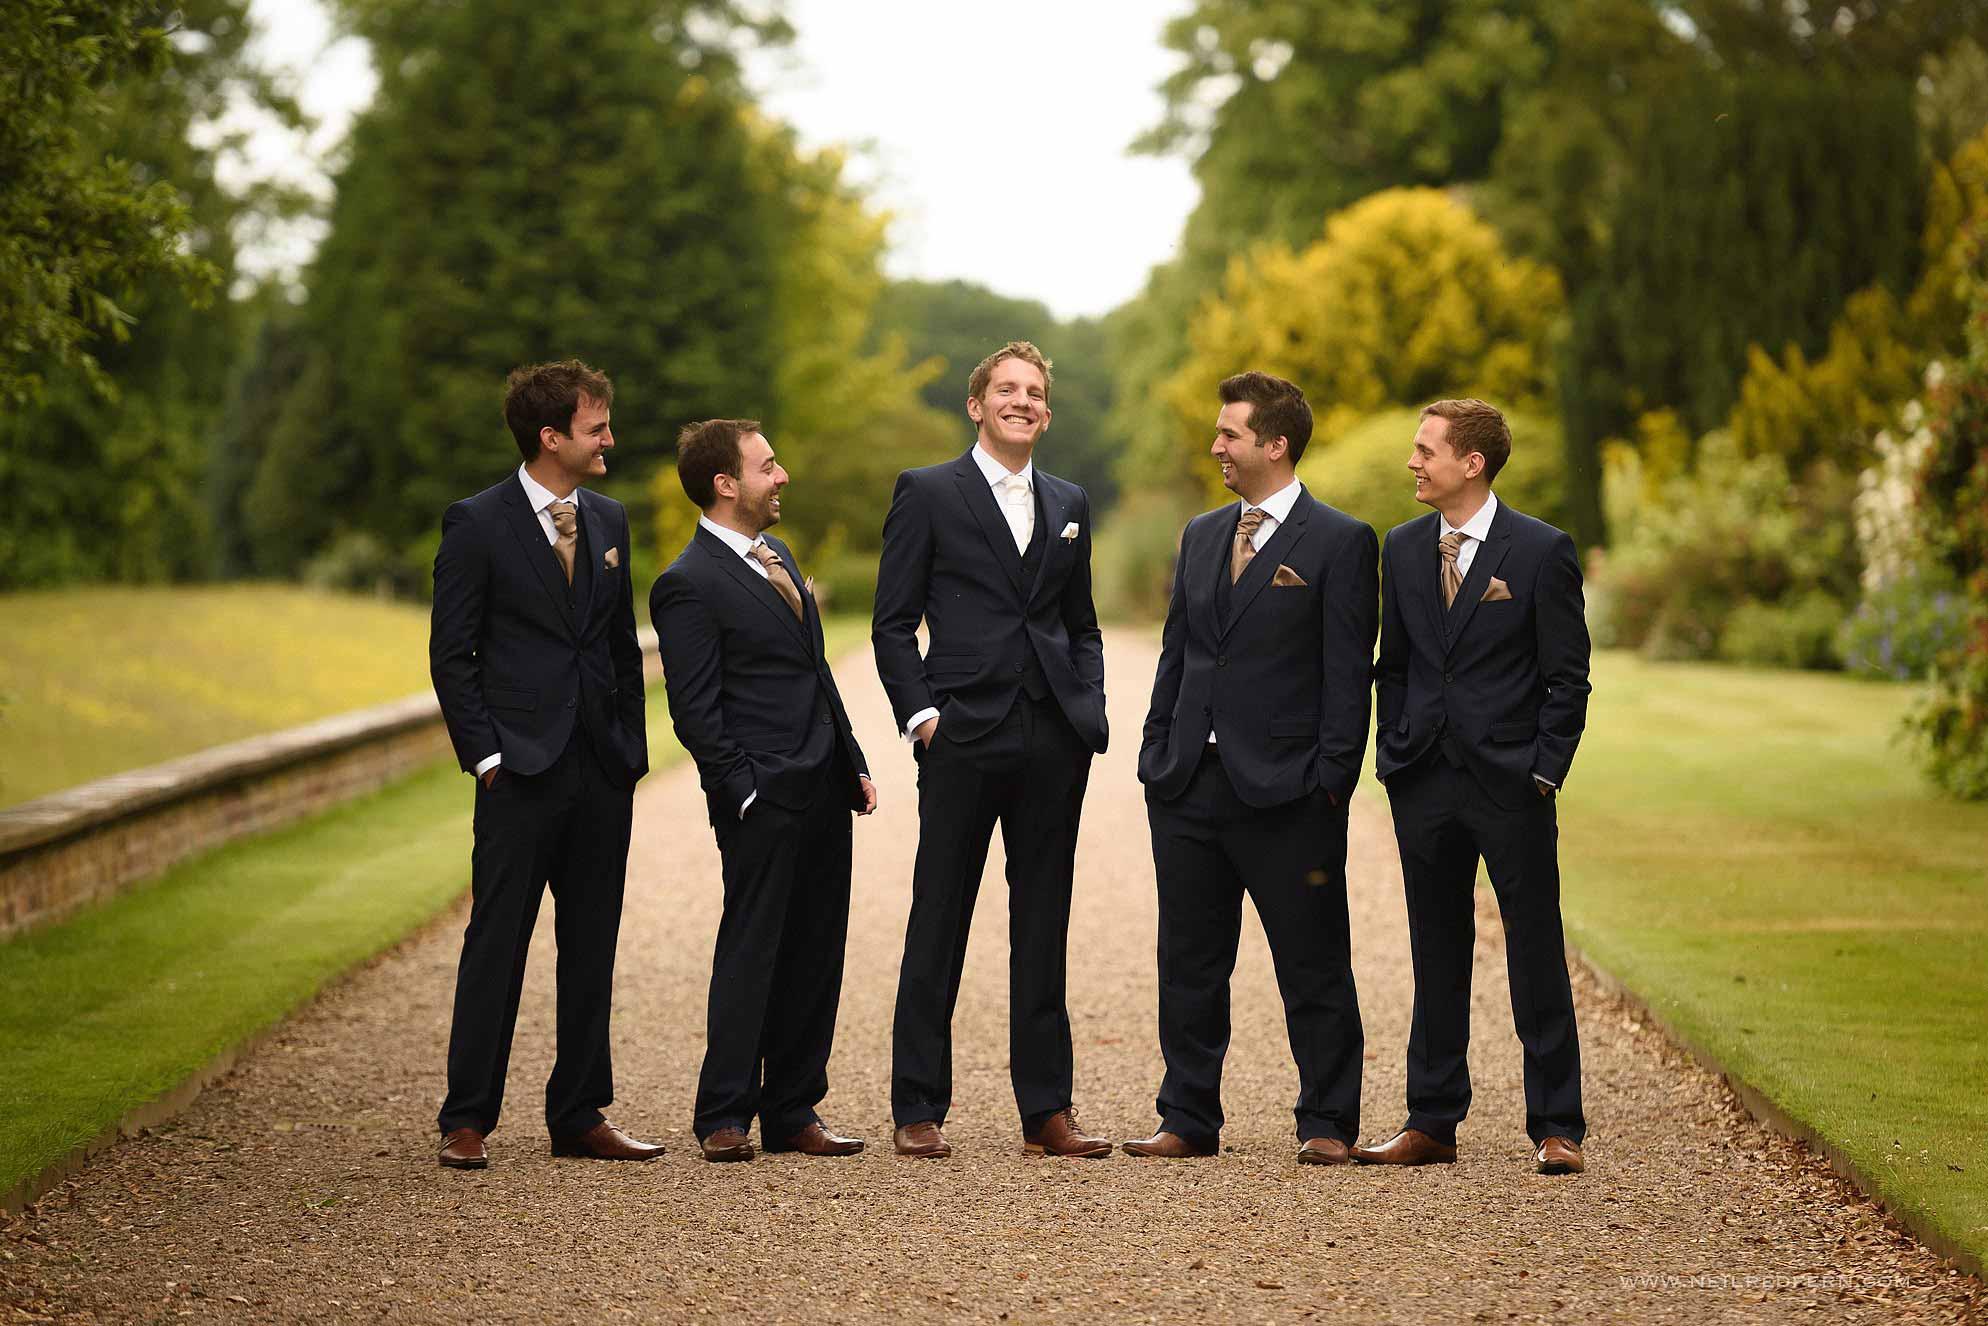 arley-hall-wedding-photography-Jo-James-06